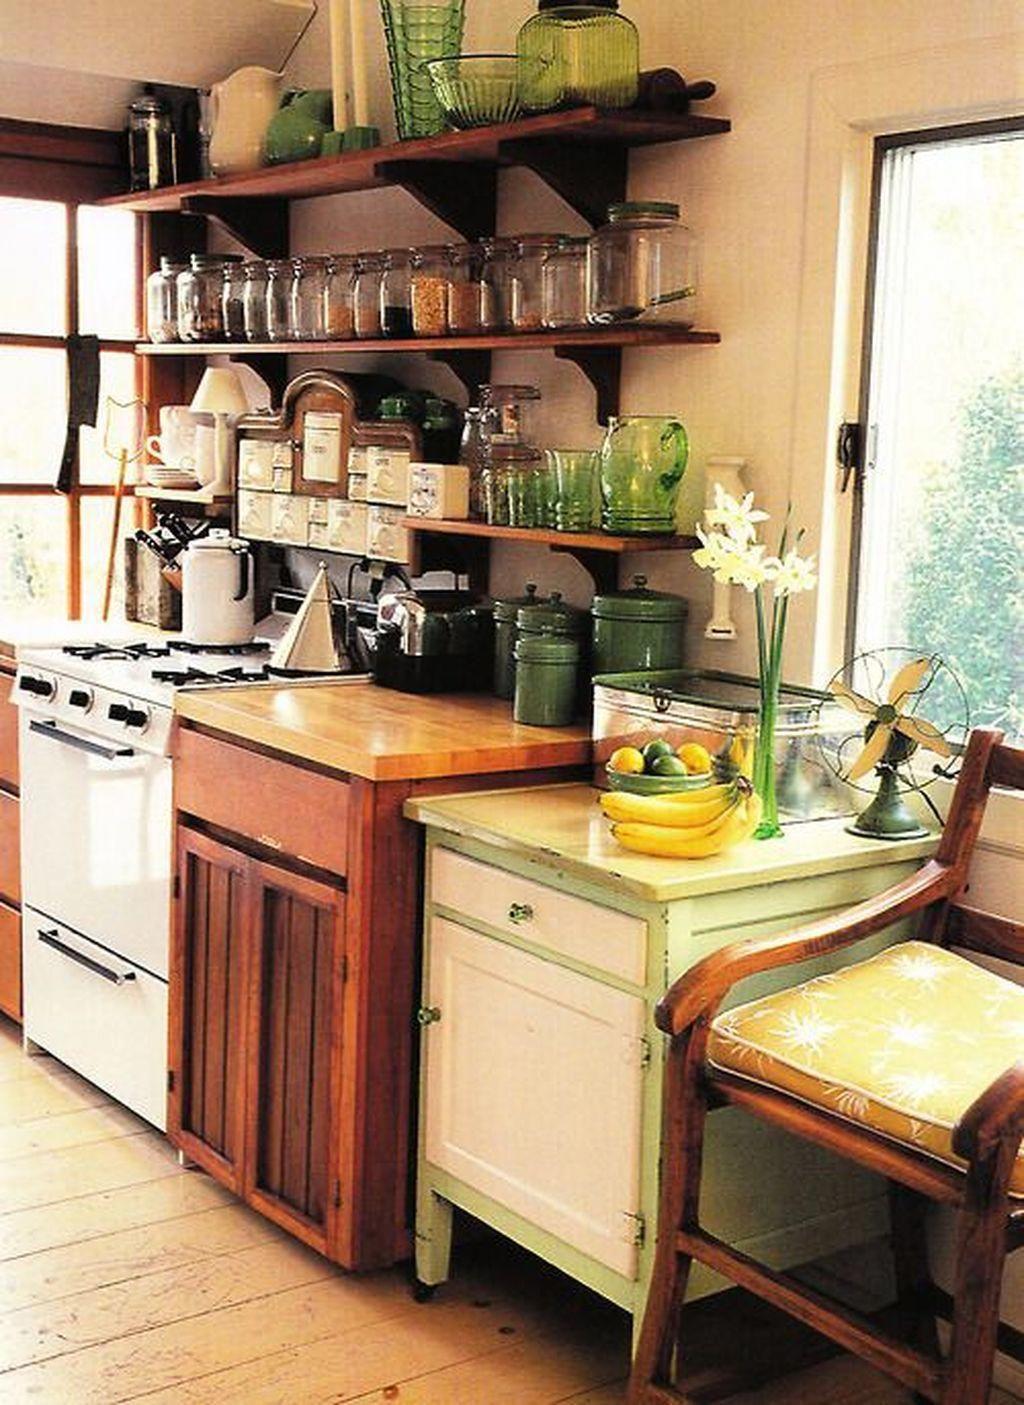 kitchendesignideas eclectic kitchen home decor kitchen country kitchen on kitchen decor hippie id=89017